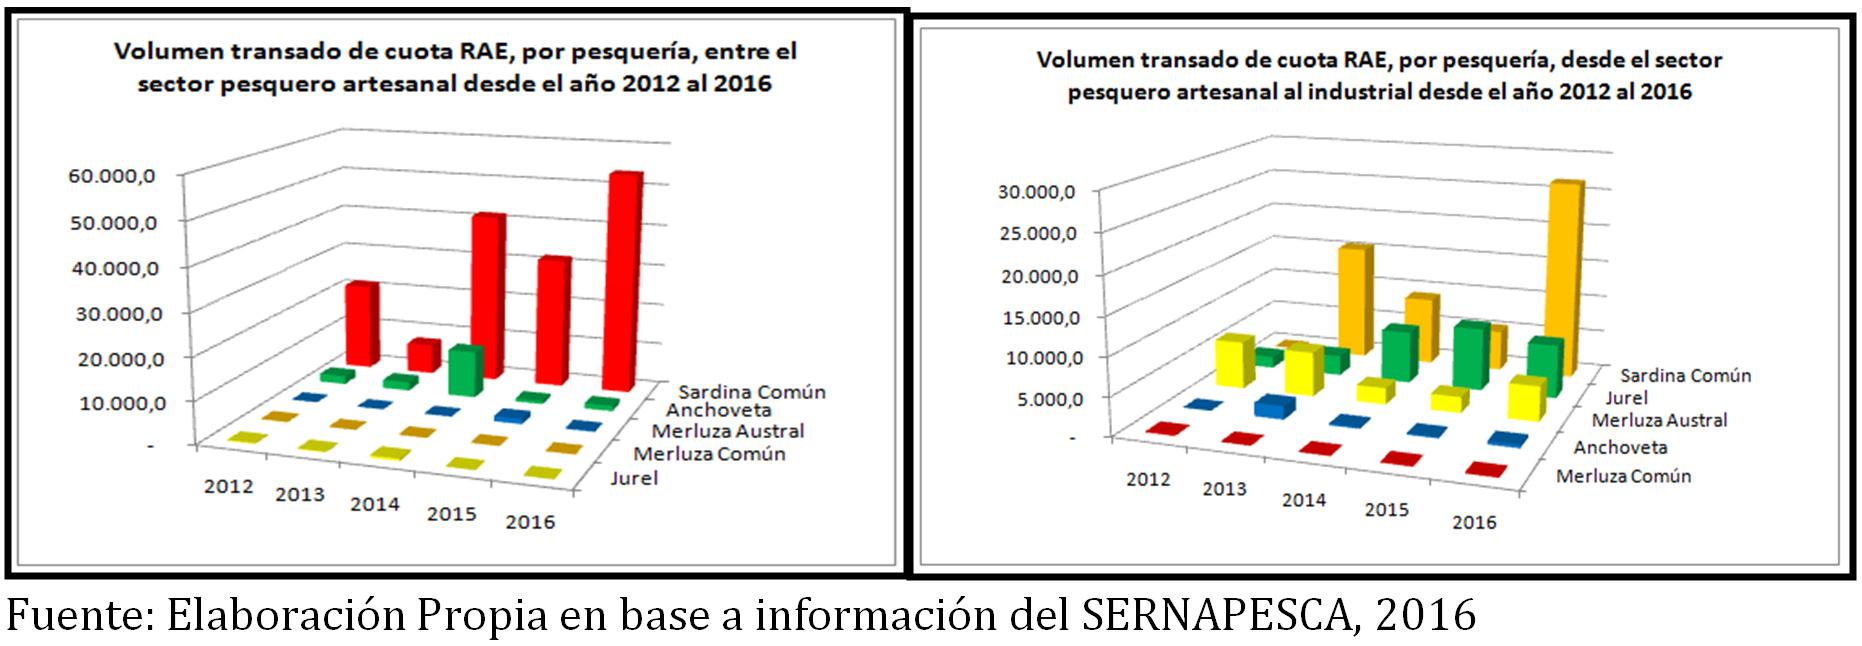 bacalao-rae-2012-2016